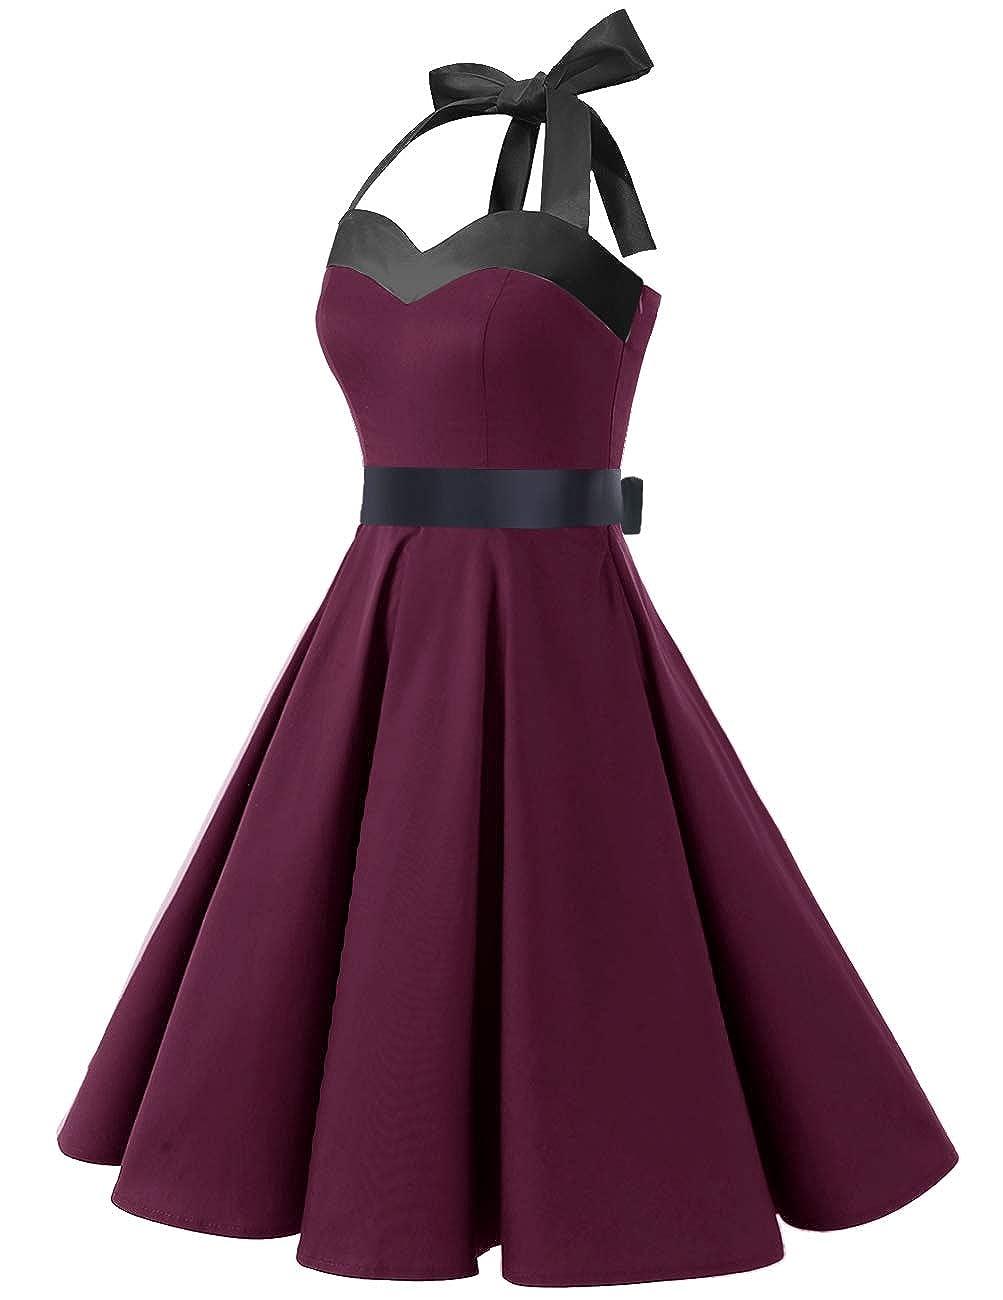 DRESSTELLS 50s Retro Halter Rockabilly Bridesmaid Audrey Dress Cocktail Dress